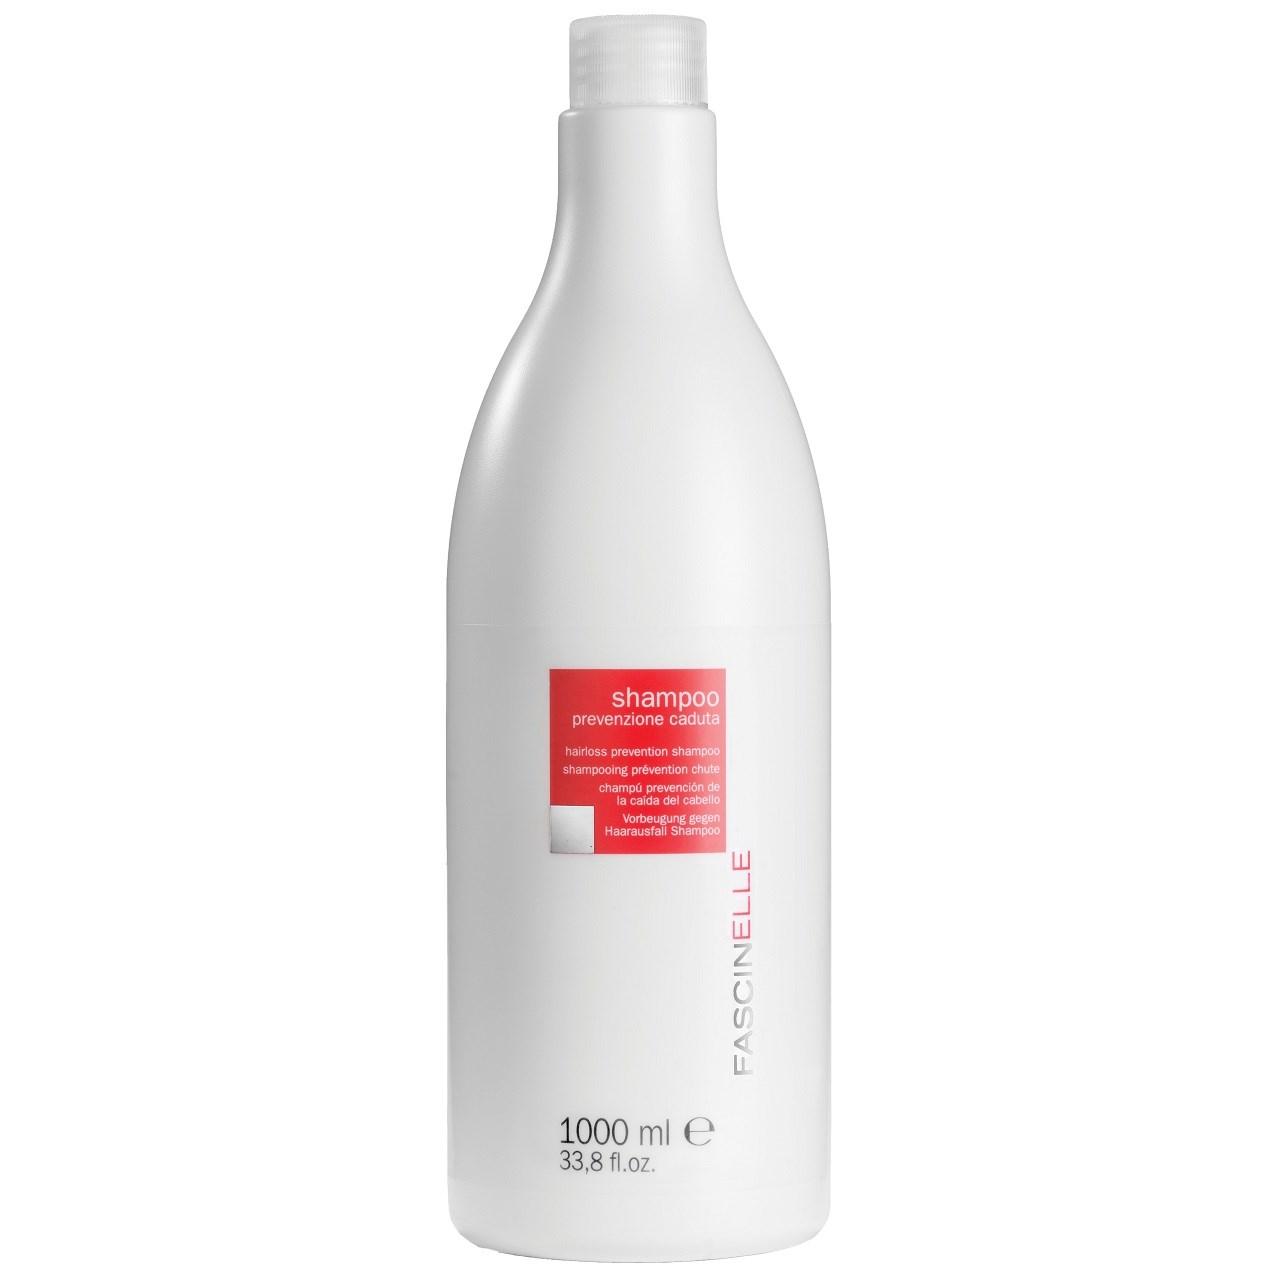 عکس شامپو ضد ریزش فشینلی مدل Hairloss Prevention حجم 1000 میلی لیتر